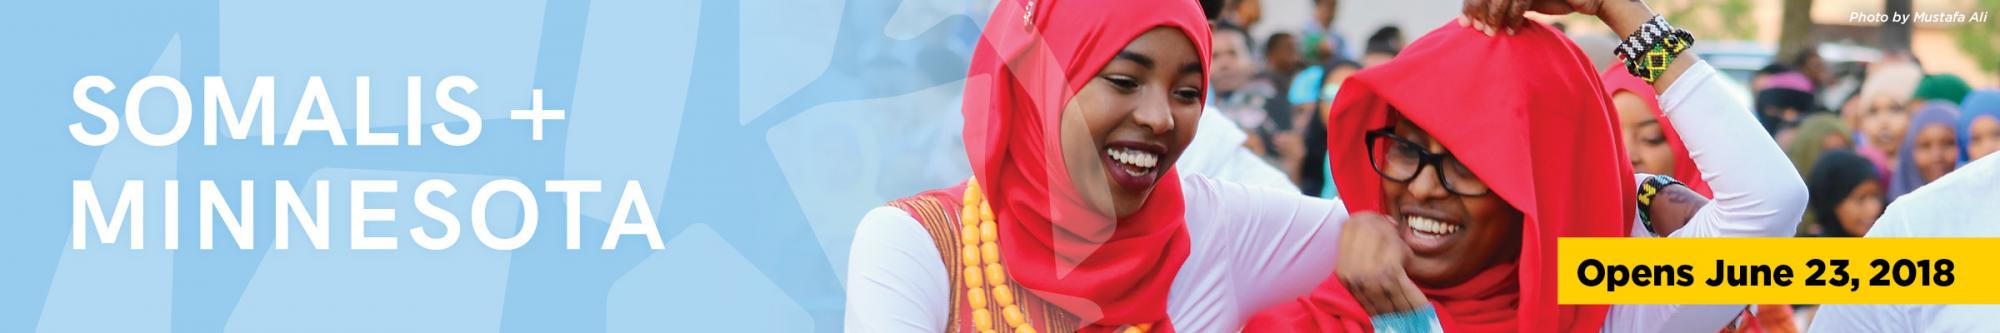 Somalis and Minnesota. Opens June 23, 2018.